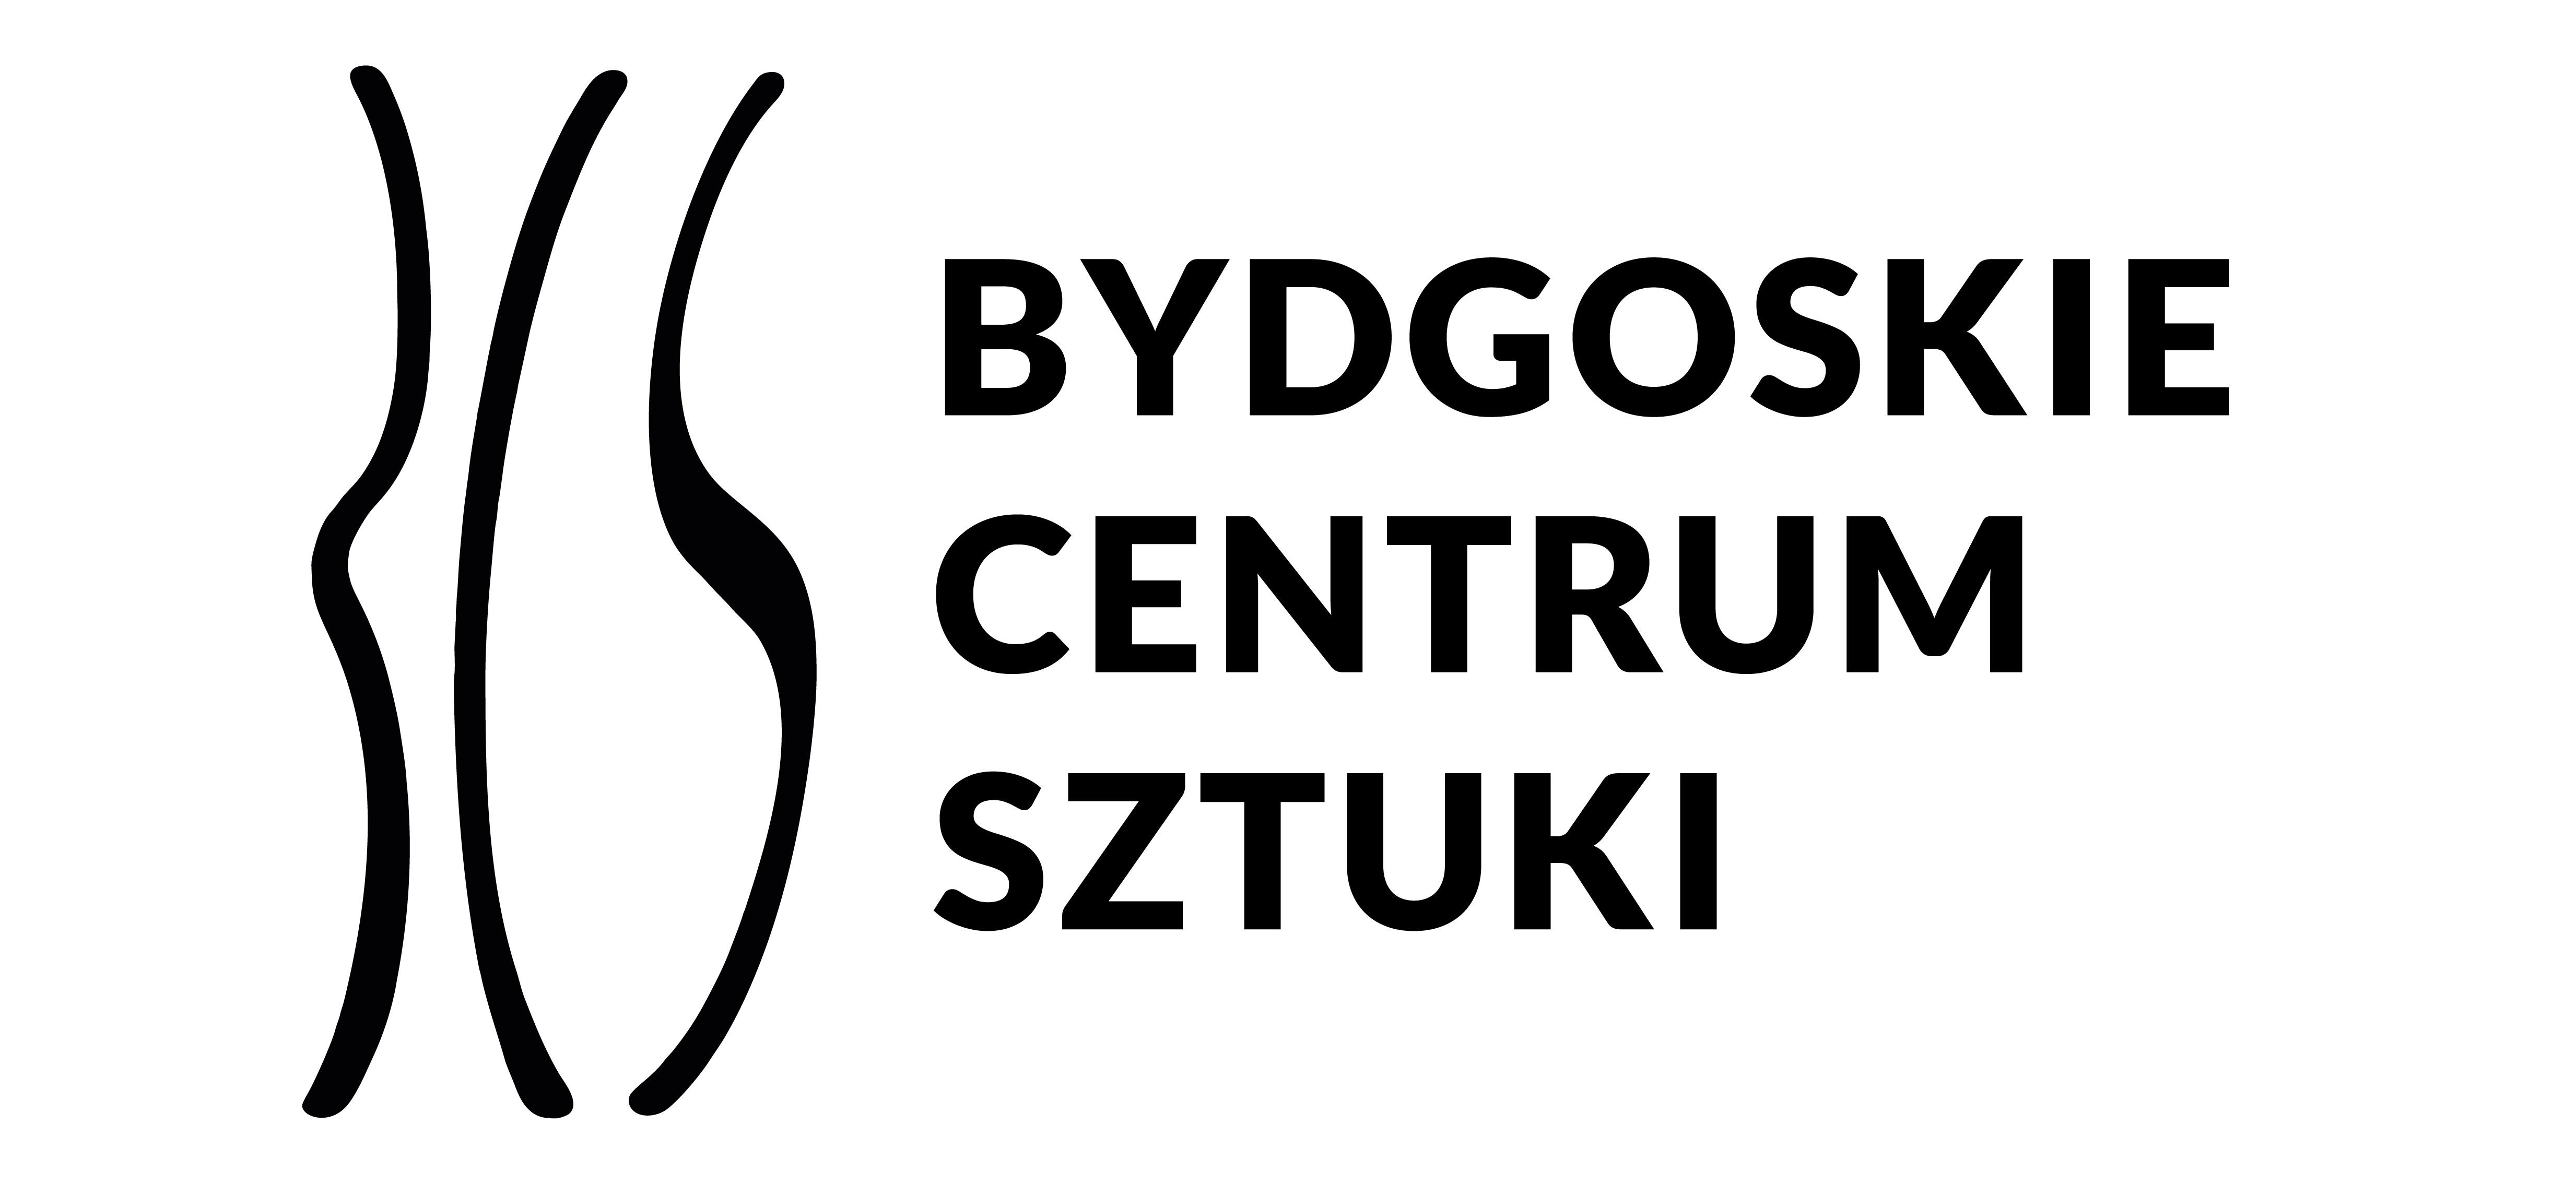 Bydgoskie Centrum Kultury